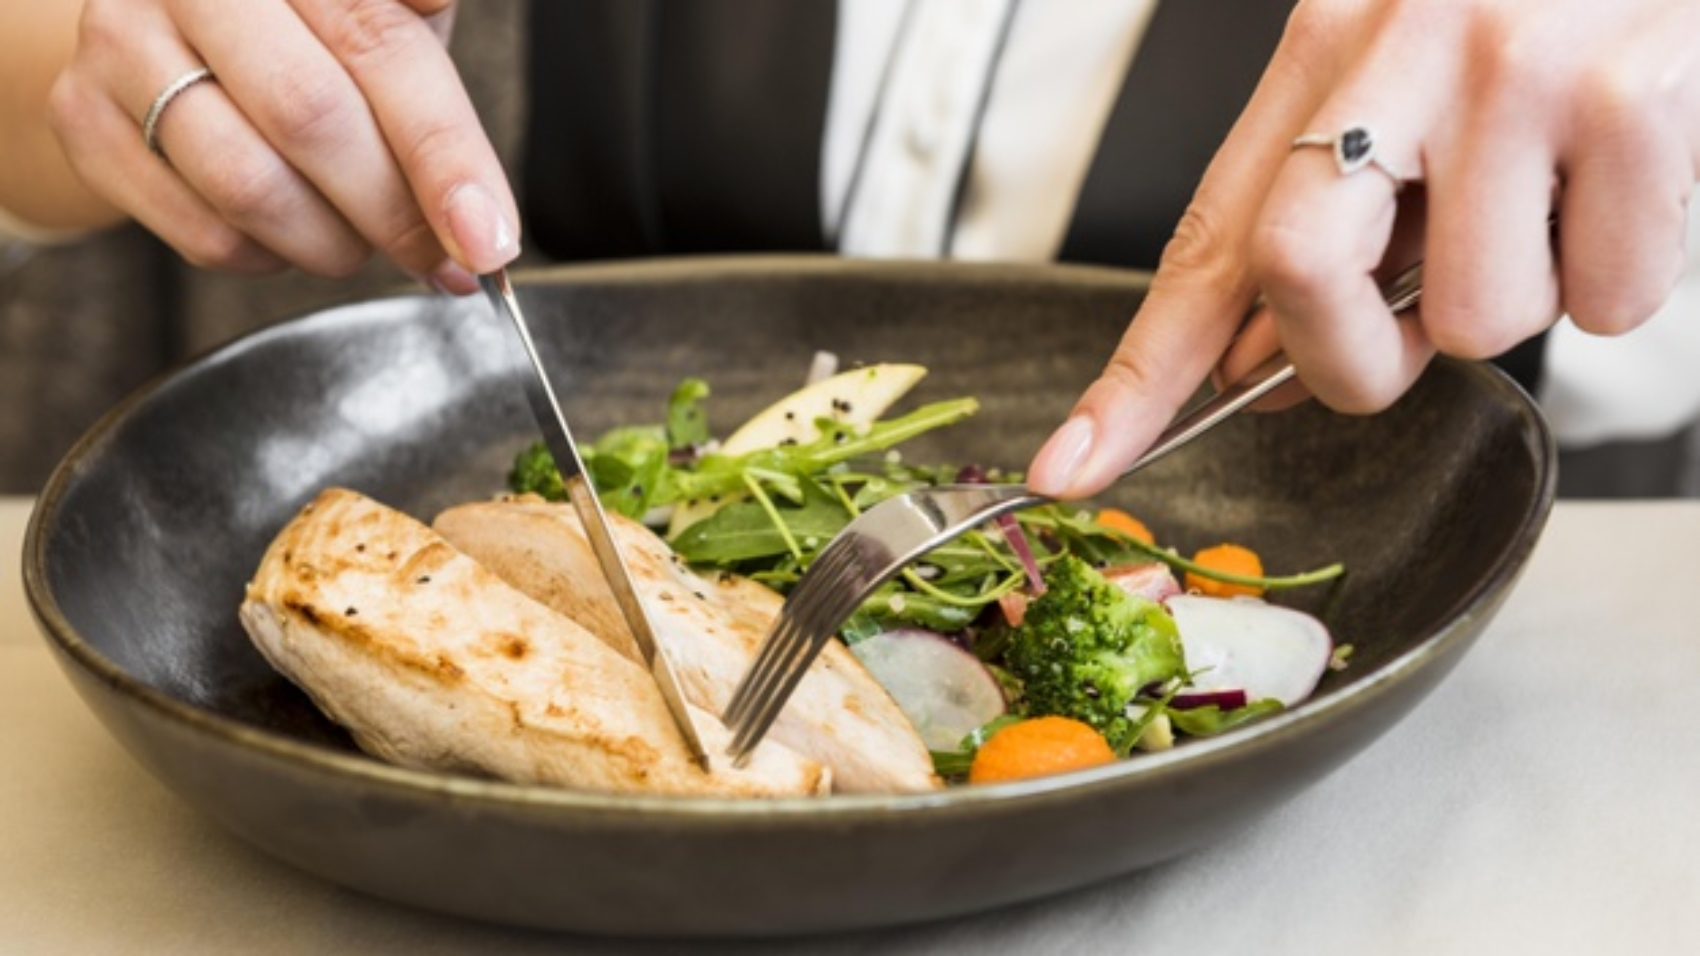 person-cutting-gourmet-chicken-breast_23-2148516895